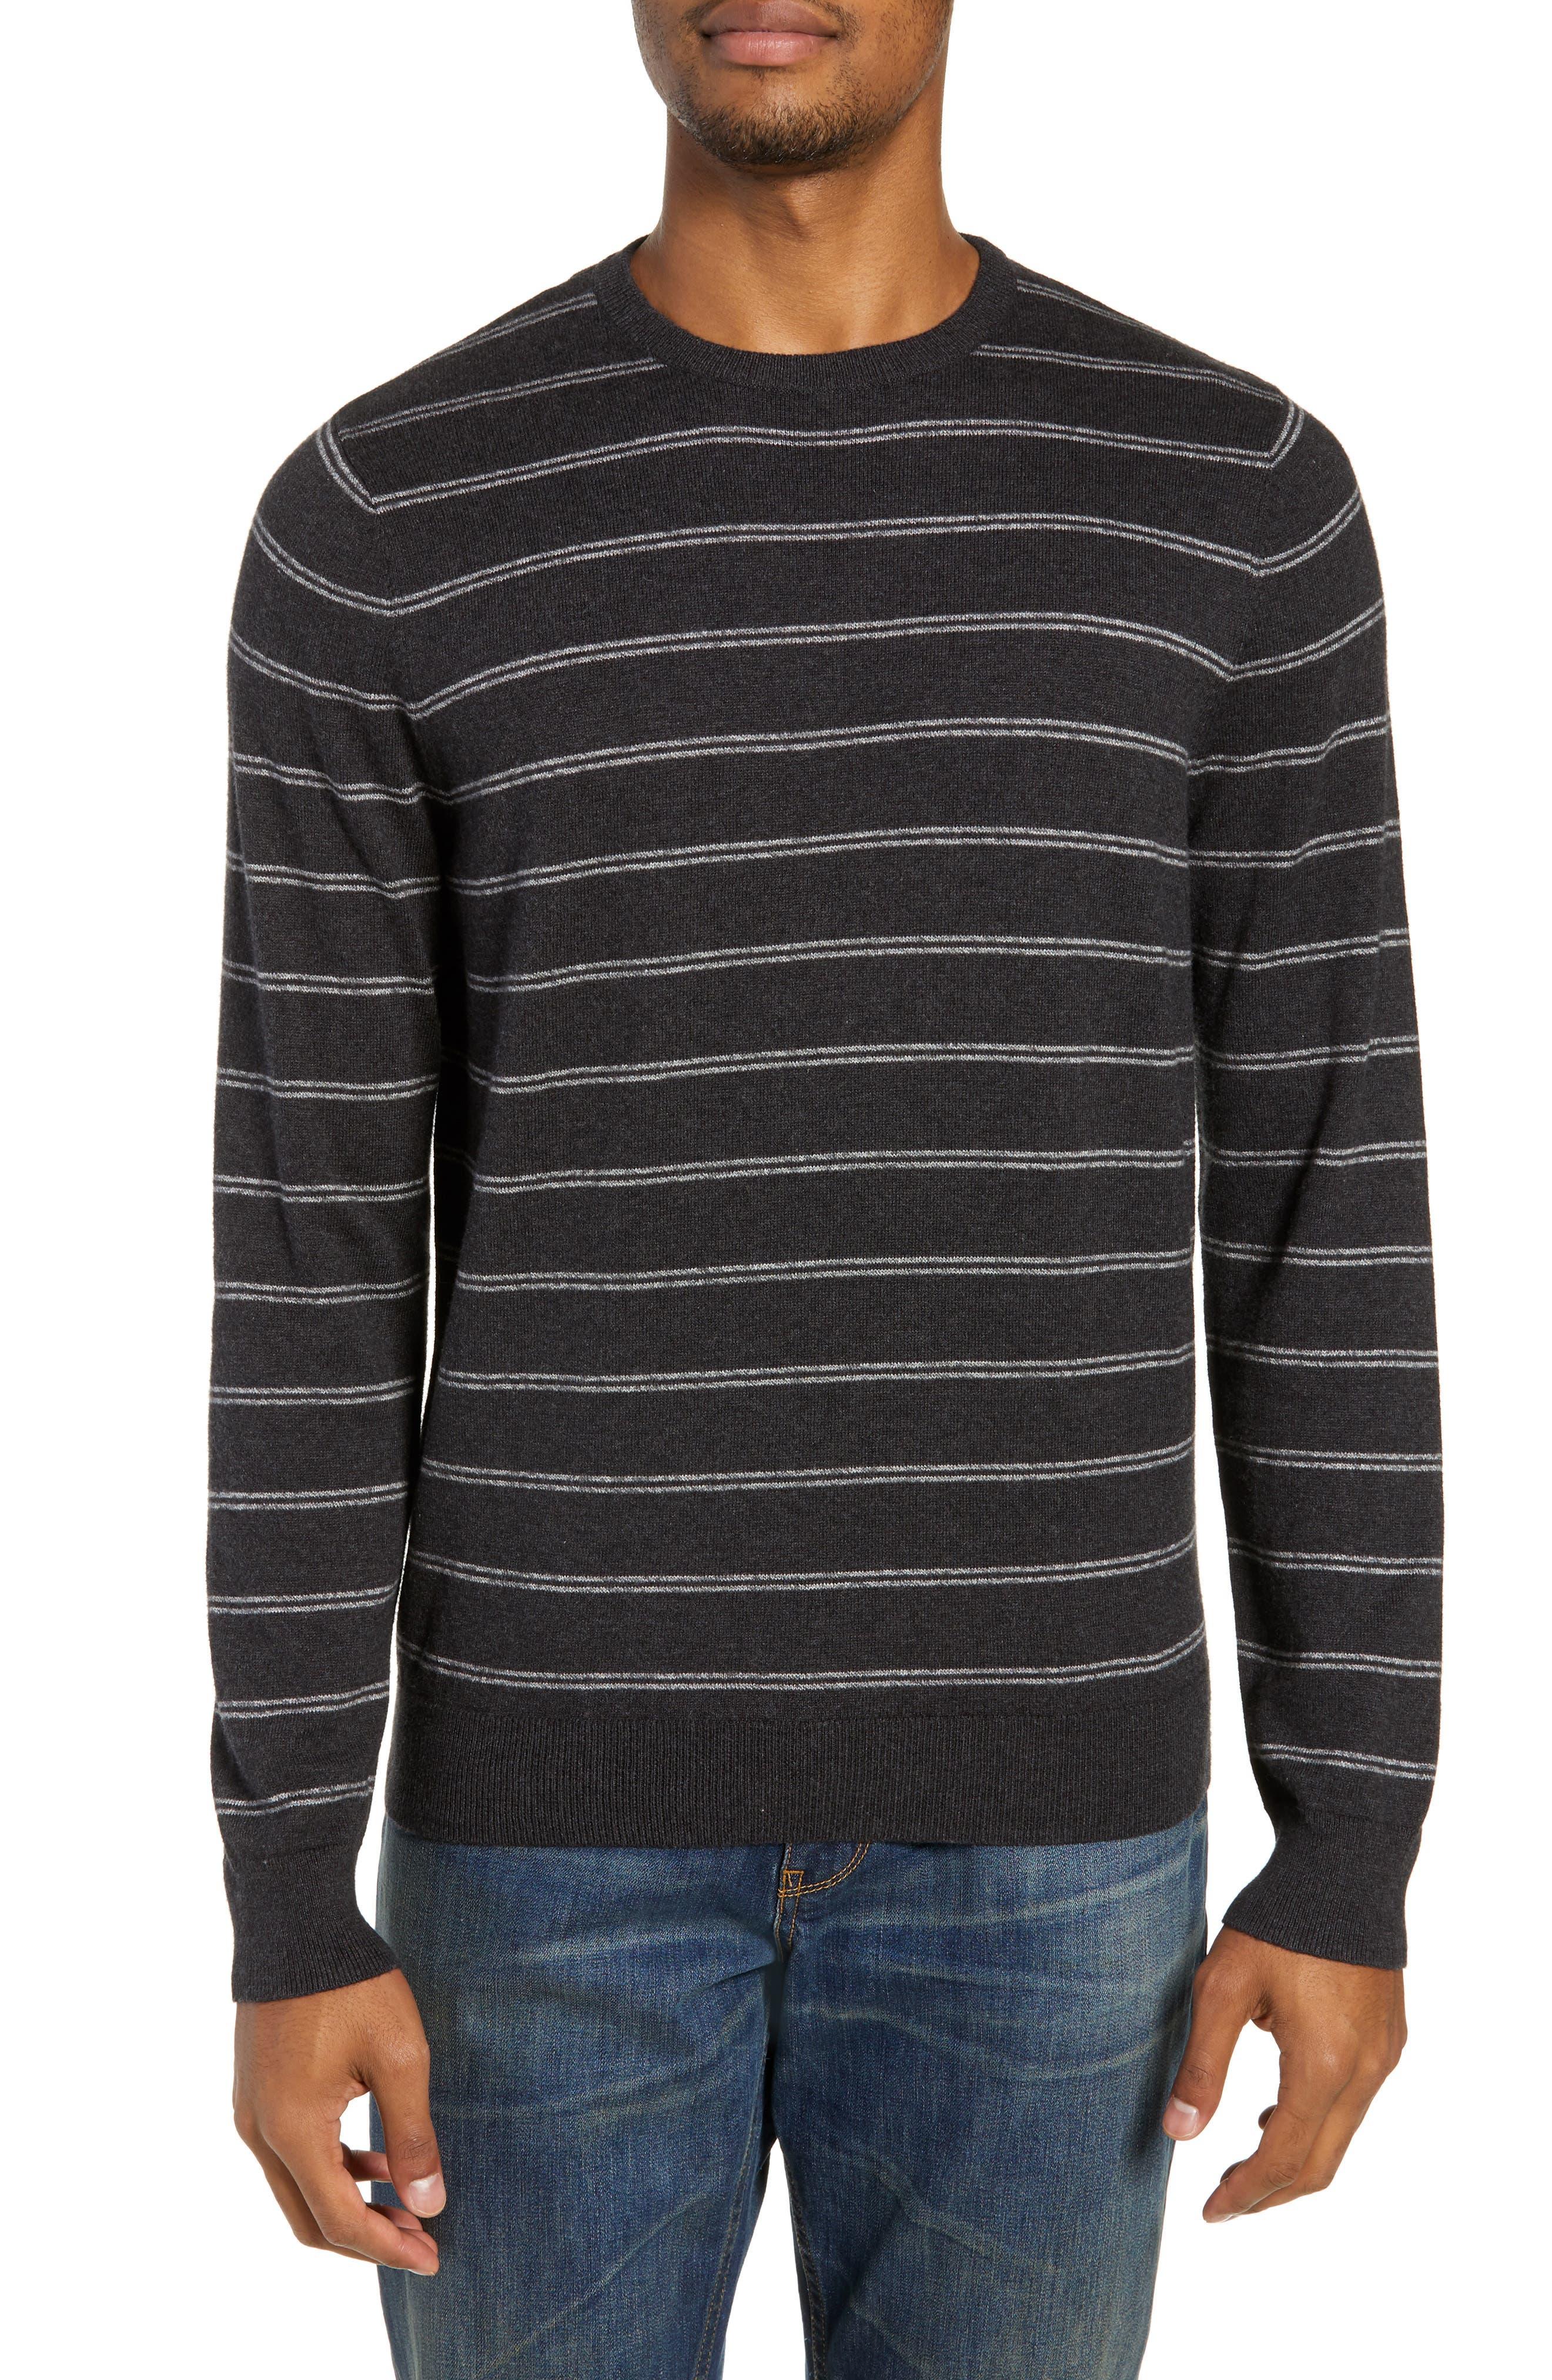 Nordstrom Shop Regular Fit Stripe Cotton & Cashmere Sweater, Grey